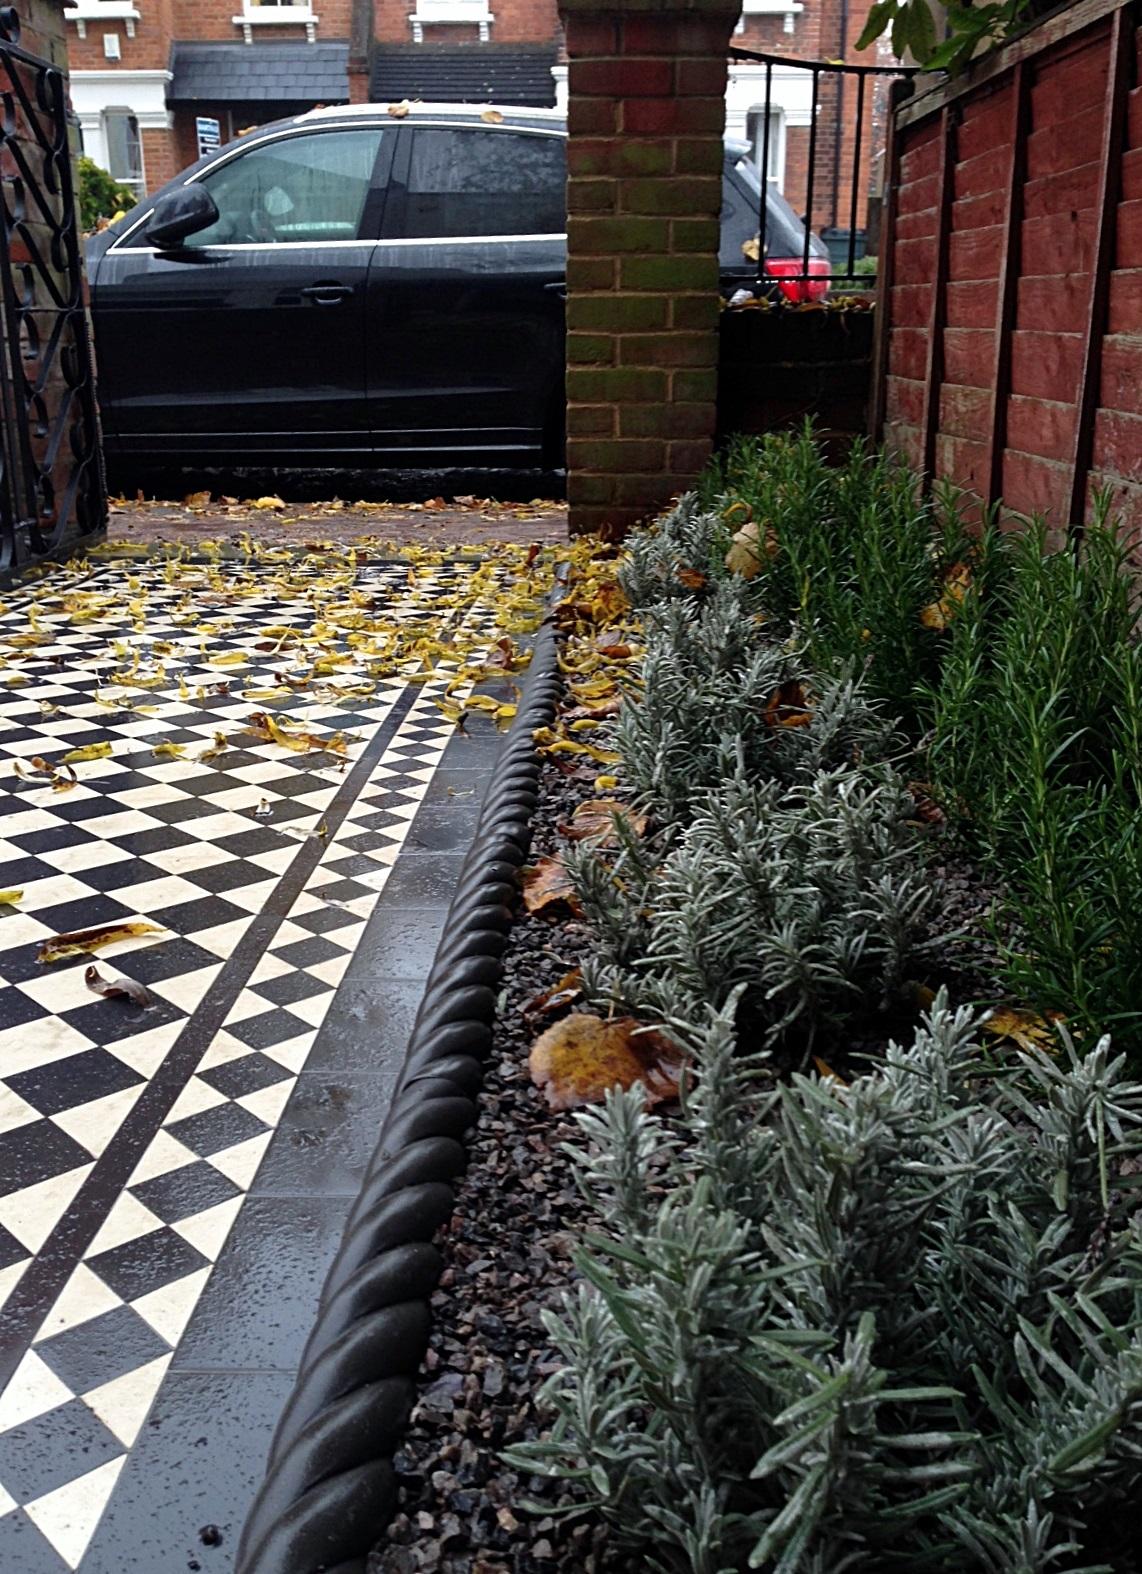 victroian black and white mosaic tile garden path paving formal planting buxus bay lavender edge tiles london (2)